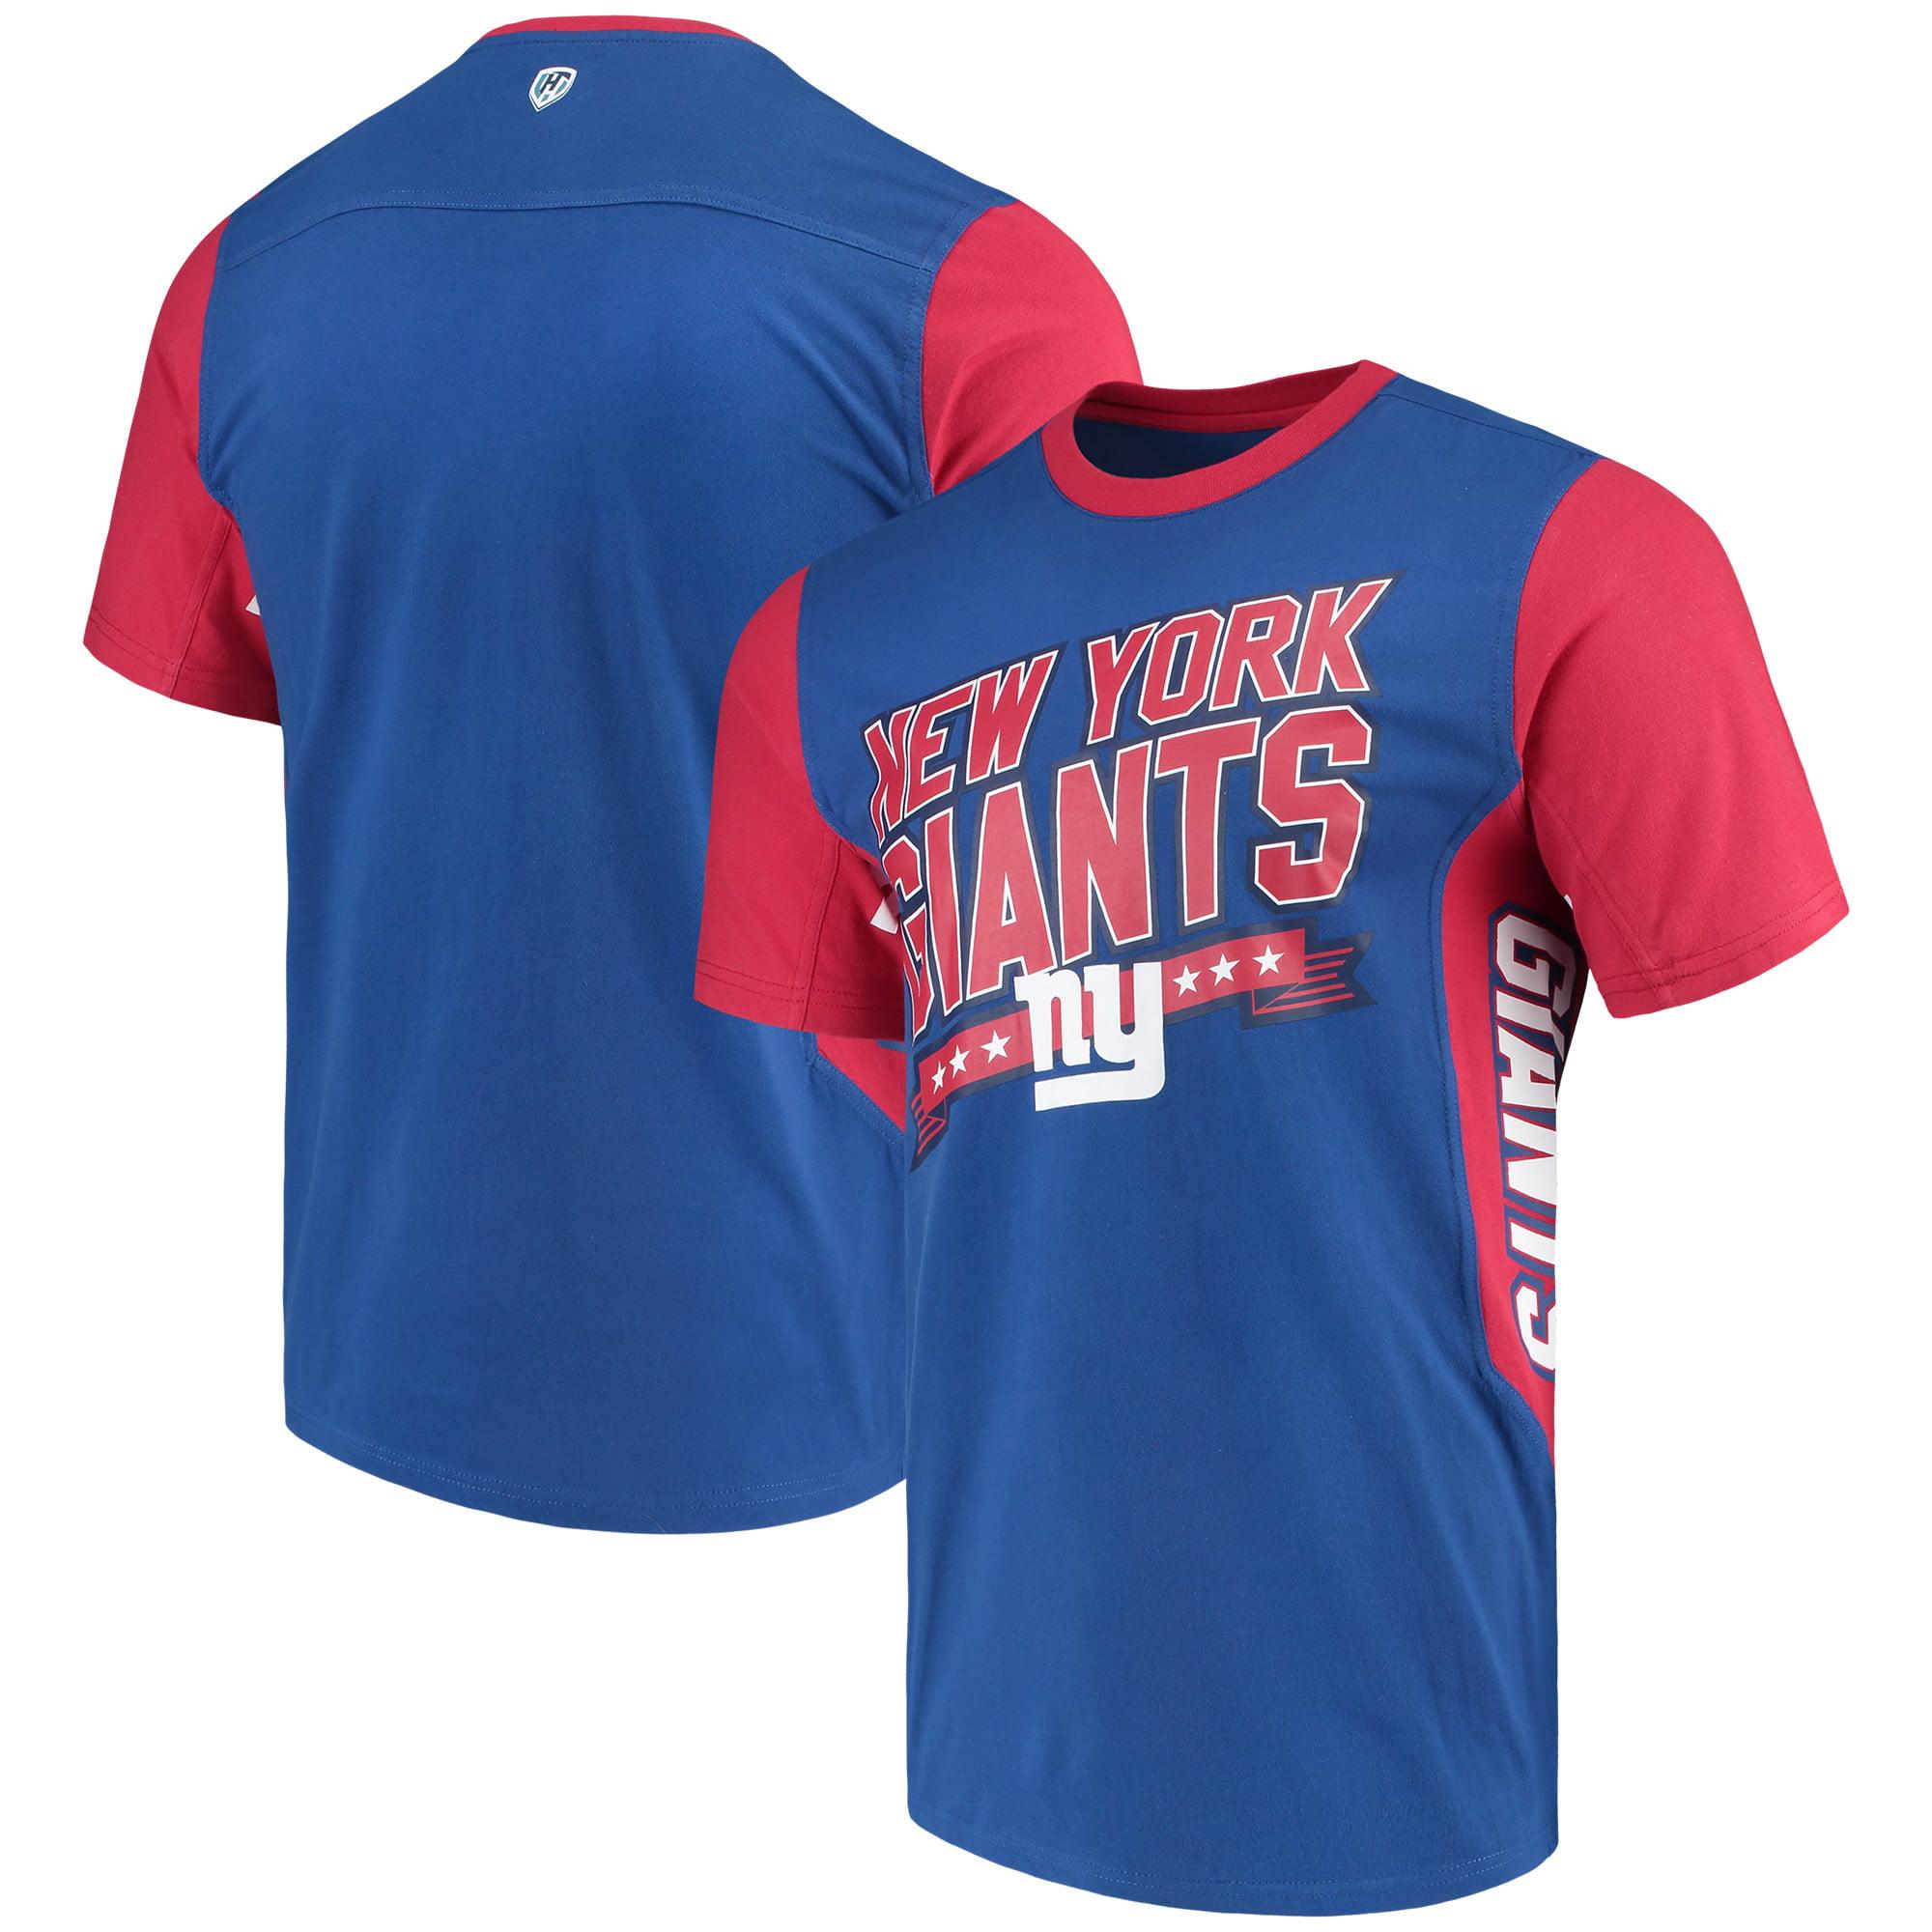 New York Giants Hands High Rally T-Shirt - Royal/Red